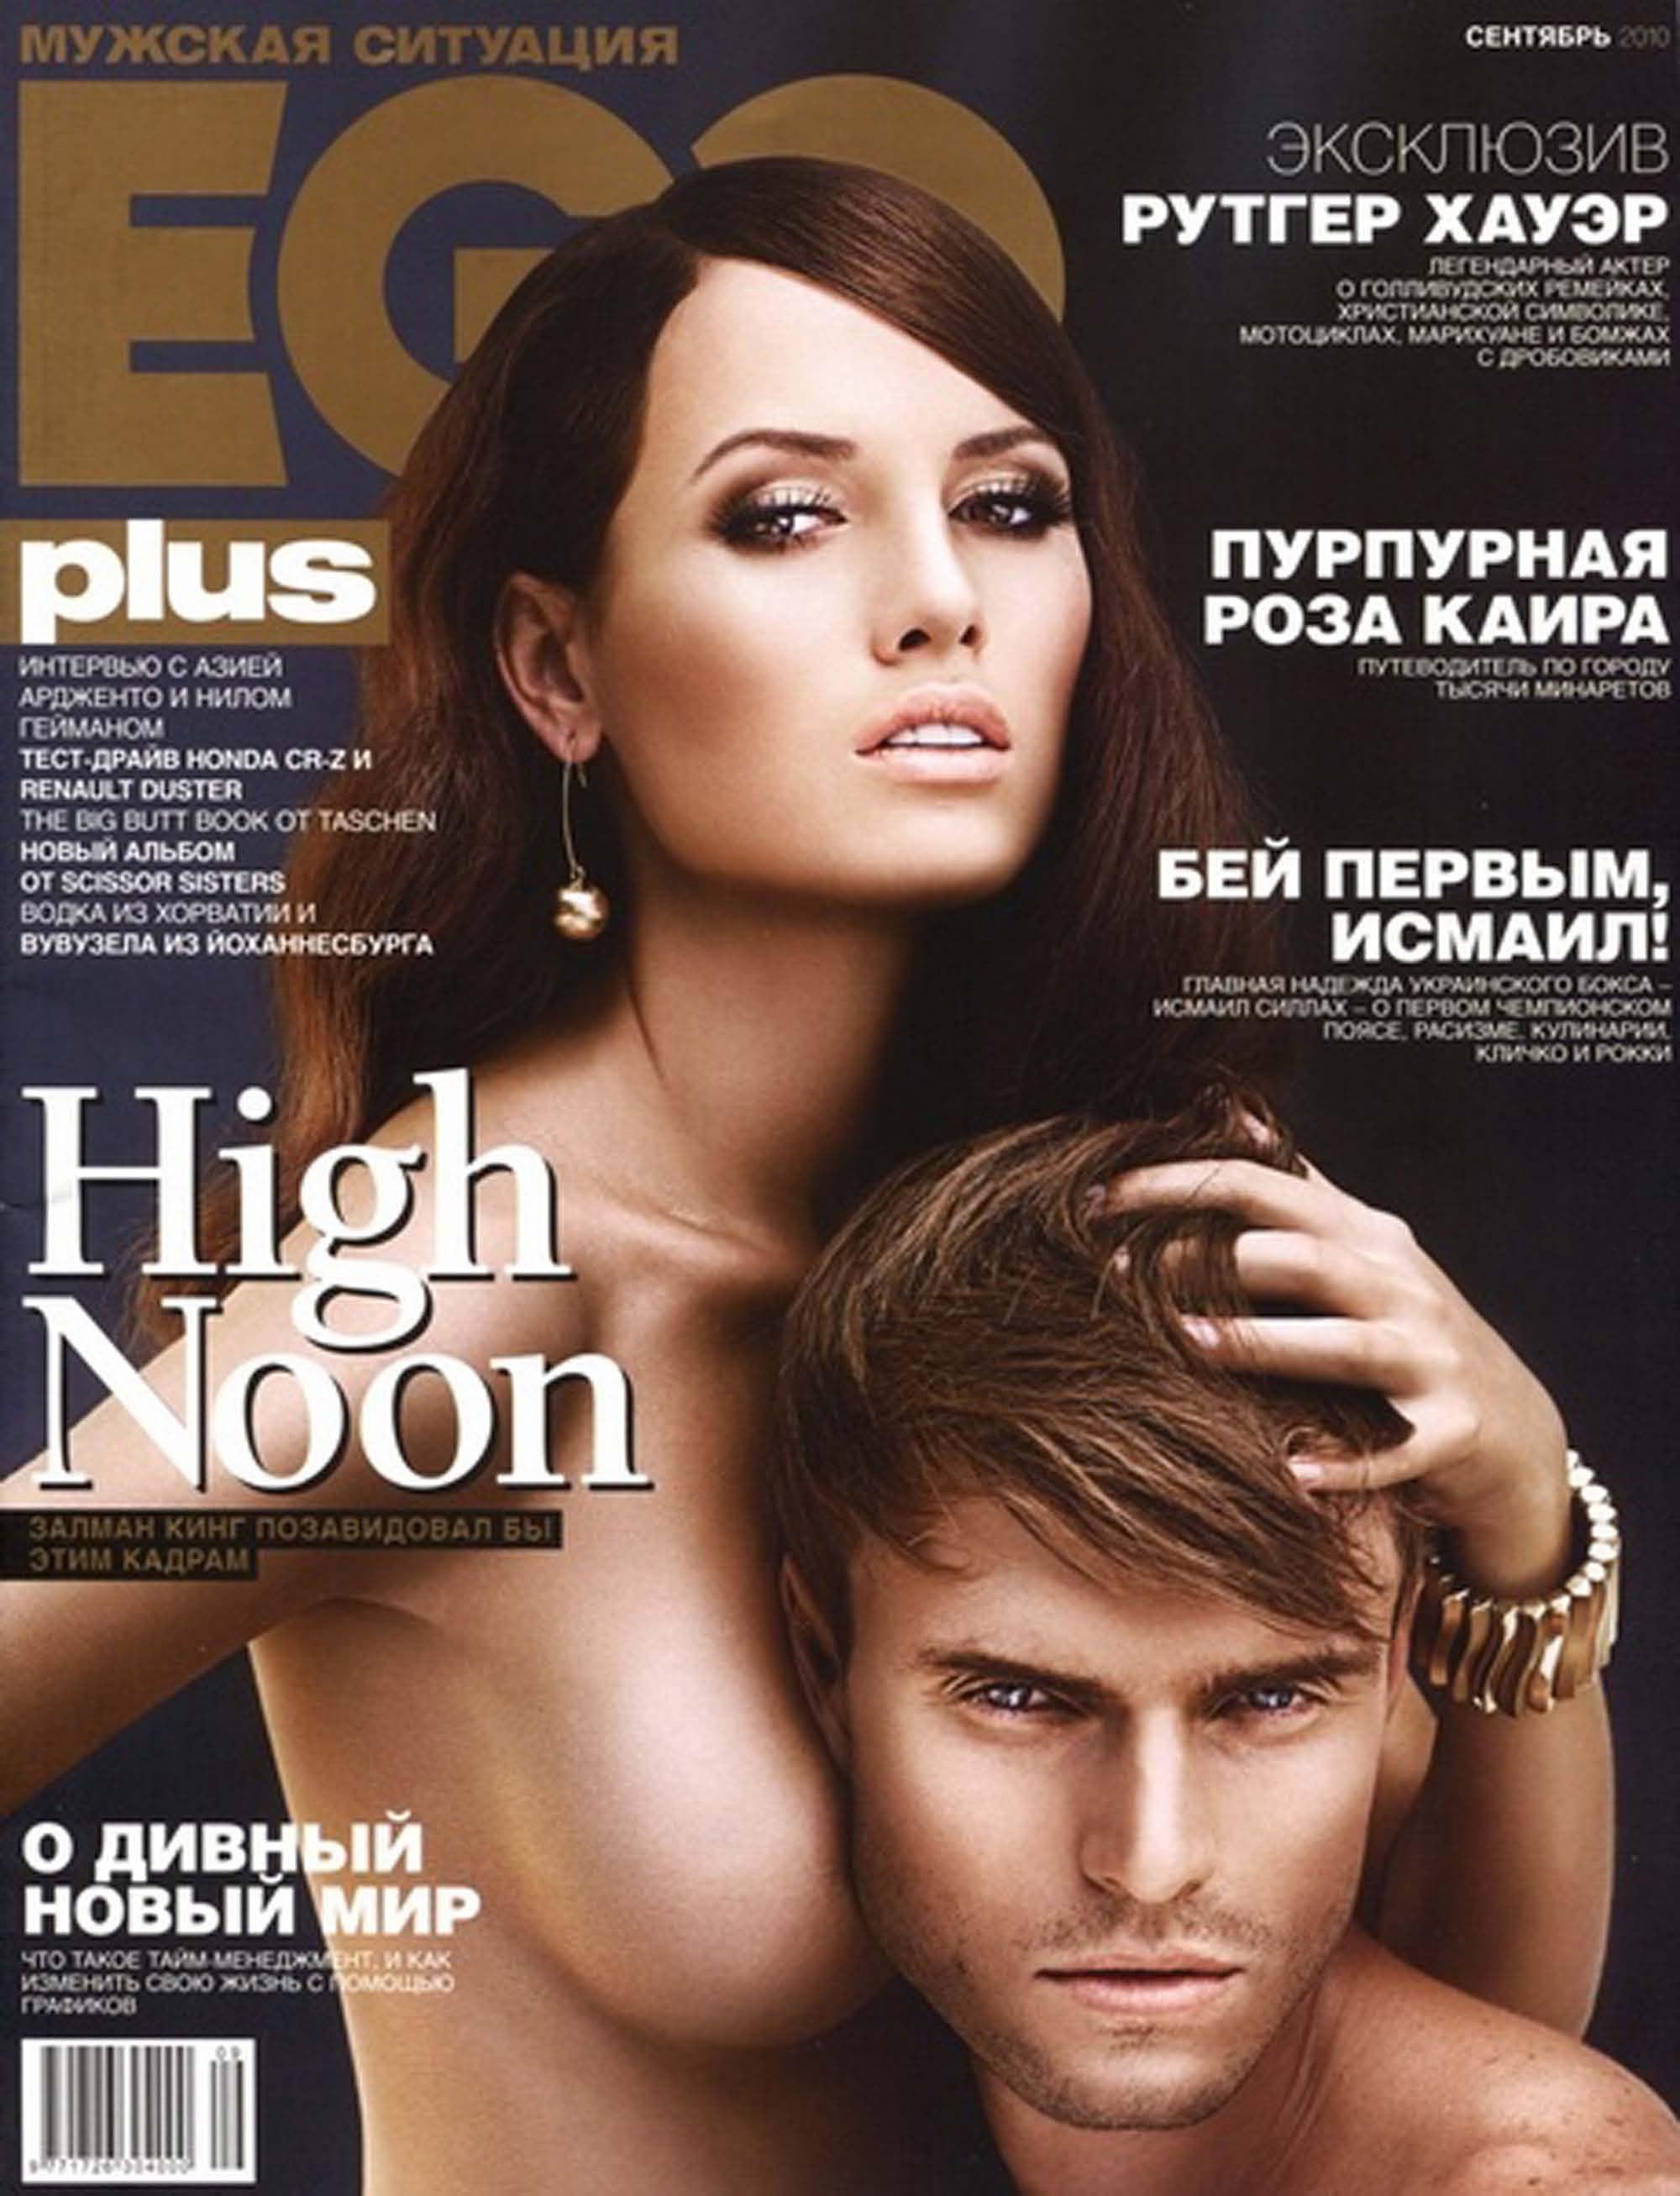 71315_Ego_Ukraine_09_2010_1_123_400lo.jpg